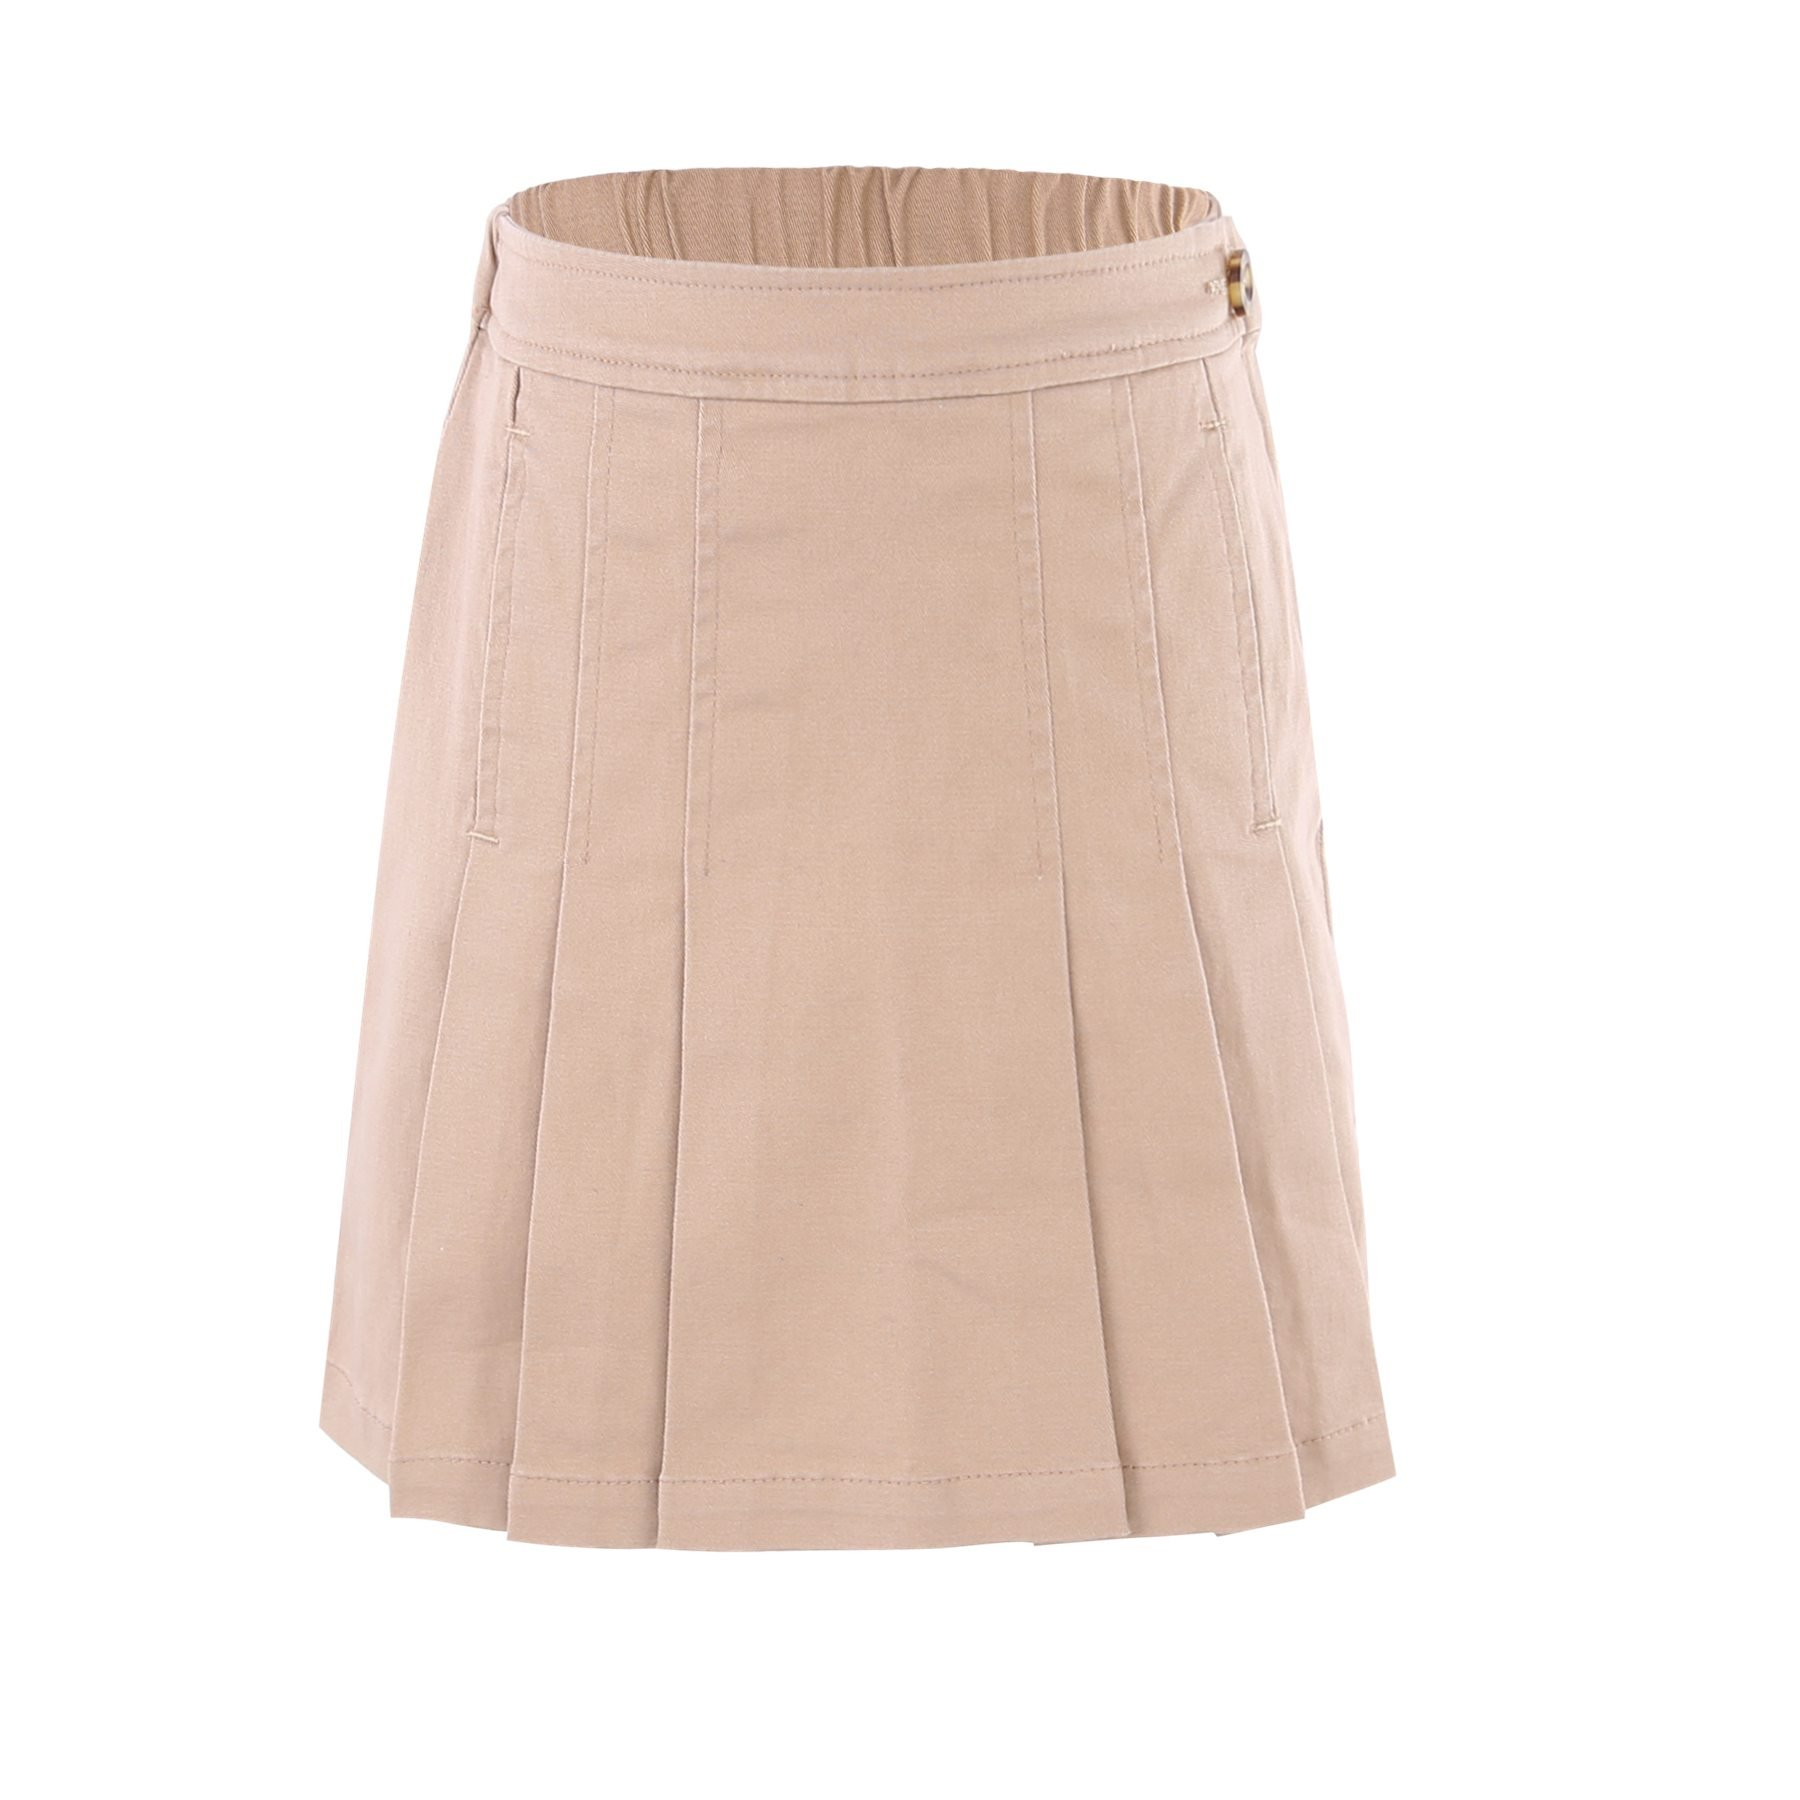 Bienzoe Girl's Cotton Stretchy Twill School Uniforms Pocket Pleated Skirt Khaki Size 16